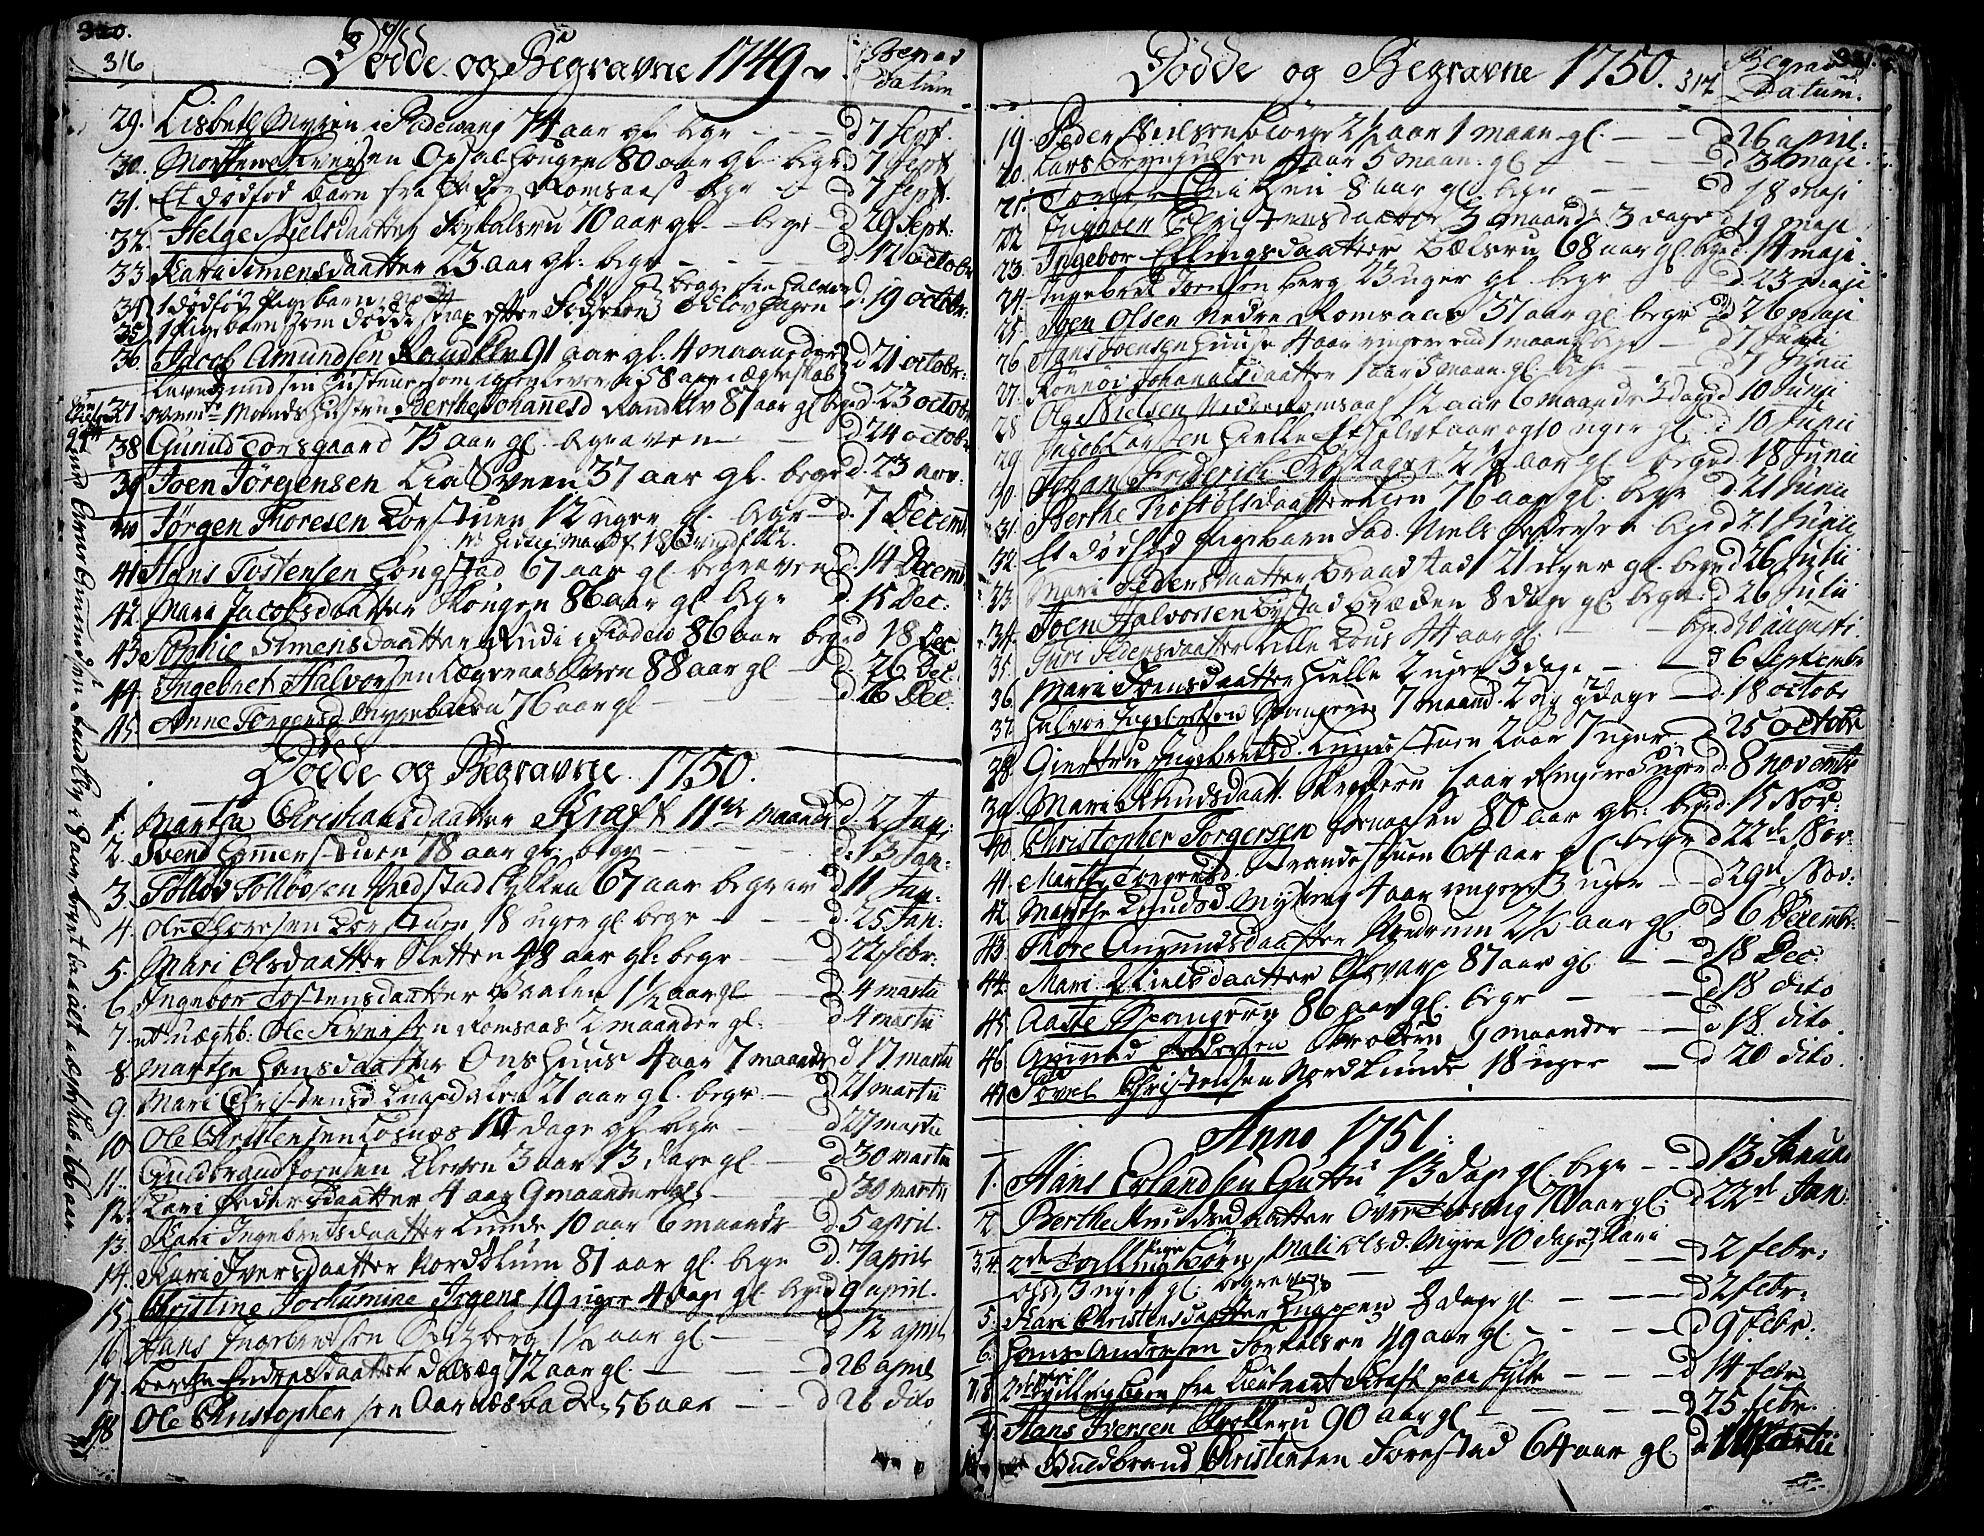 SAH, Ringebu prestekontor, Ministerialbok nr. 2, 1734-1780, s. 316-317